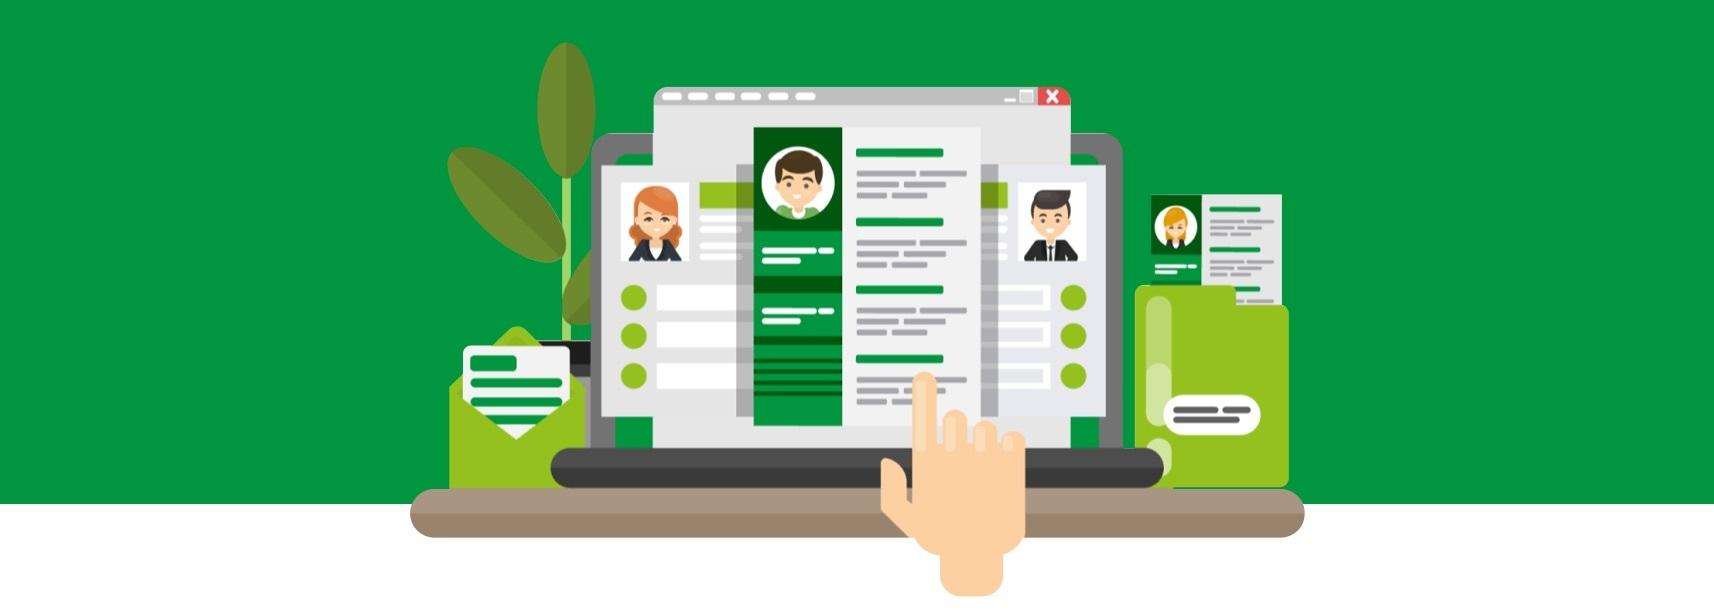 Weople - rekrytointityökalu, jota edelsi Design Sprint